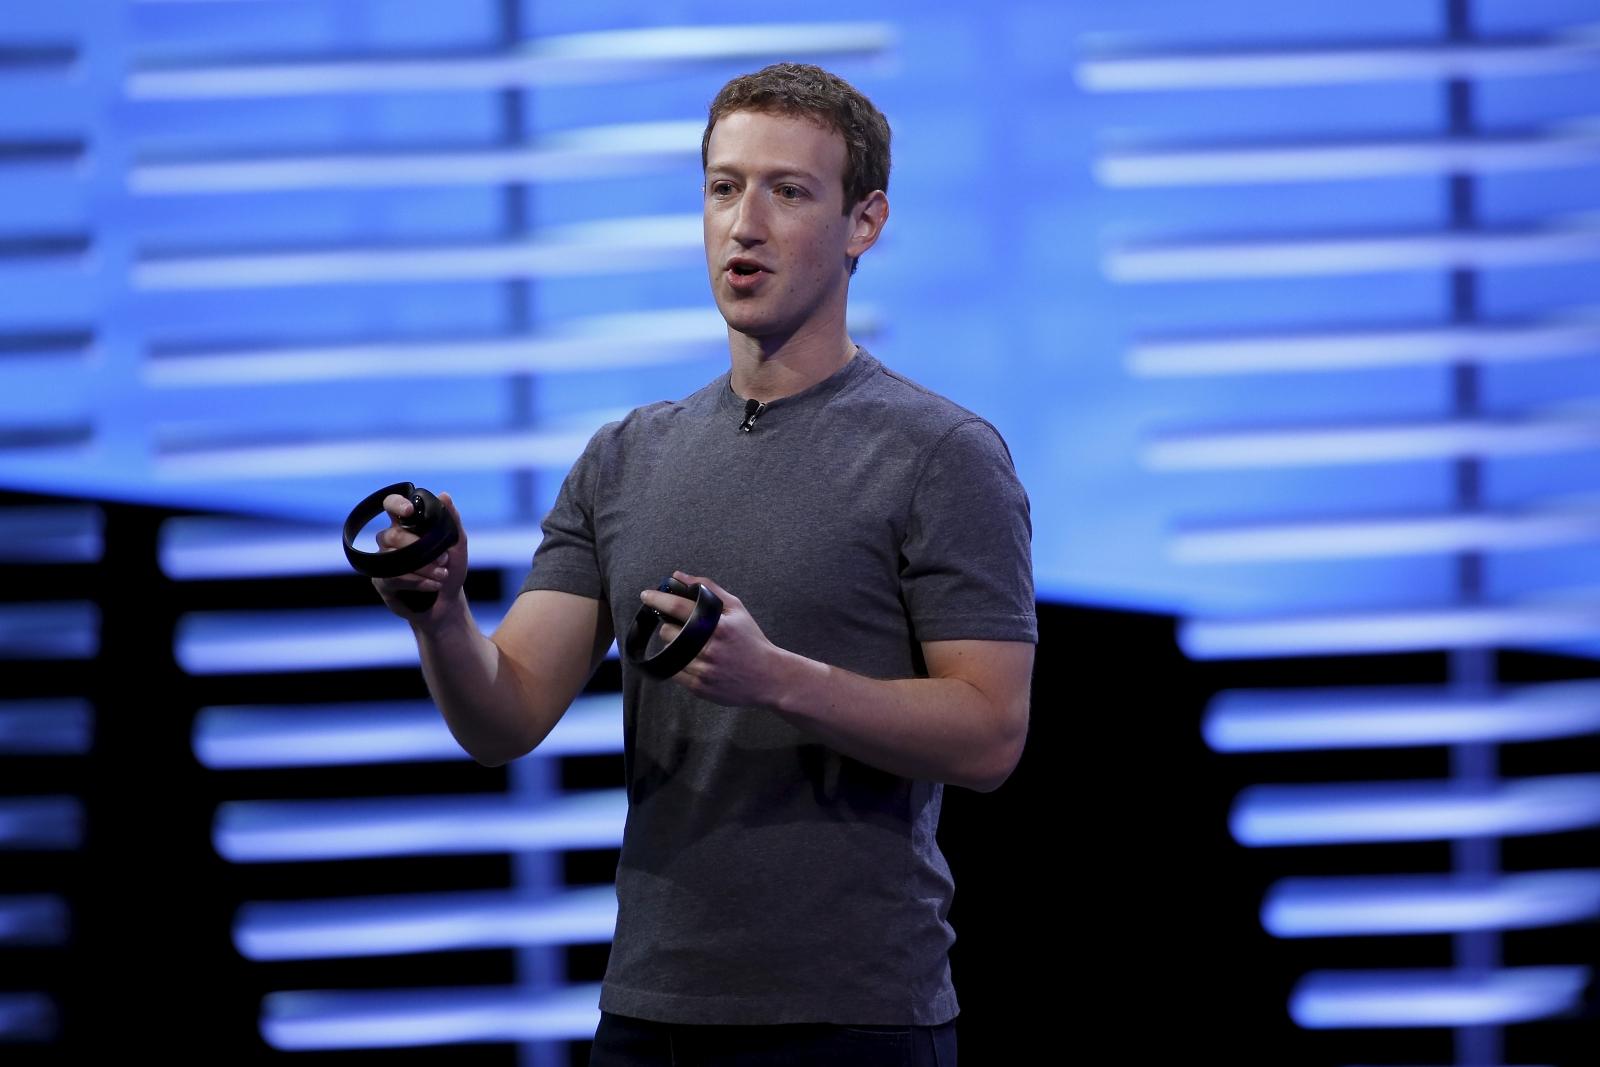 Facebook CEO Marc Zuckerberg